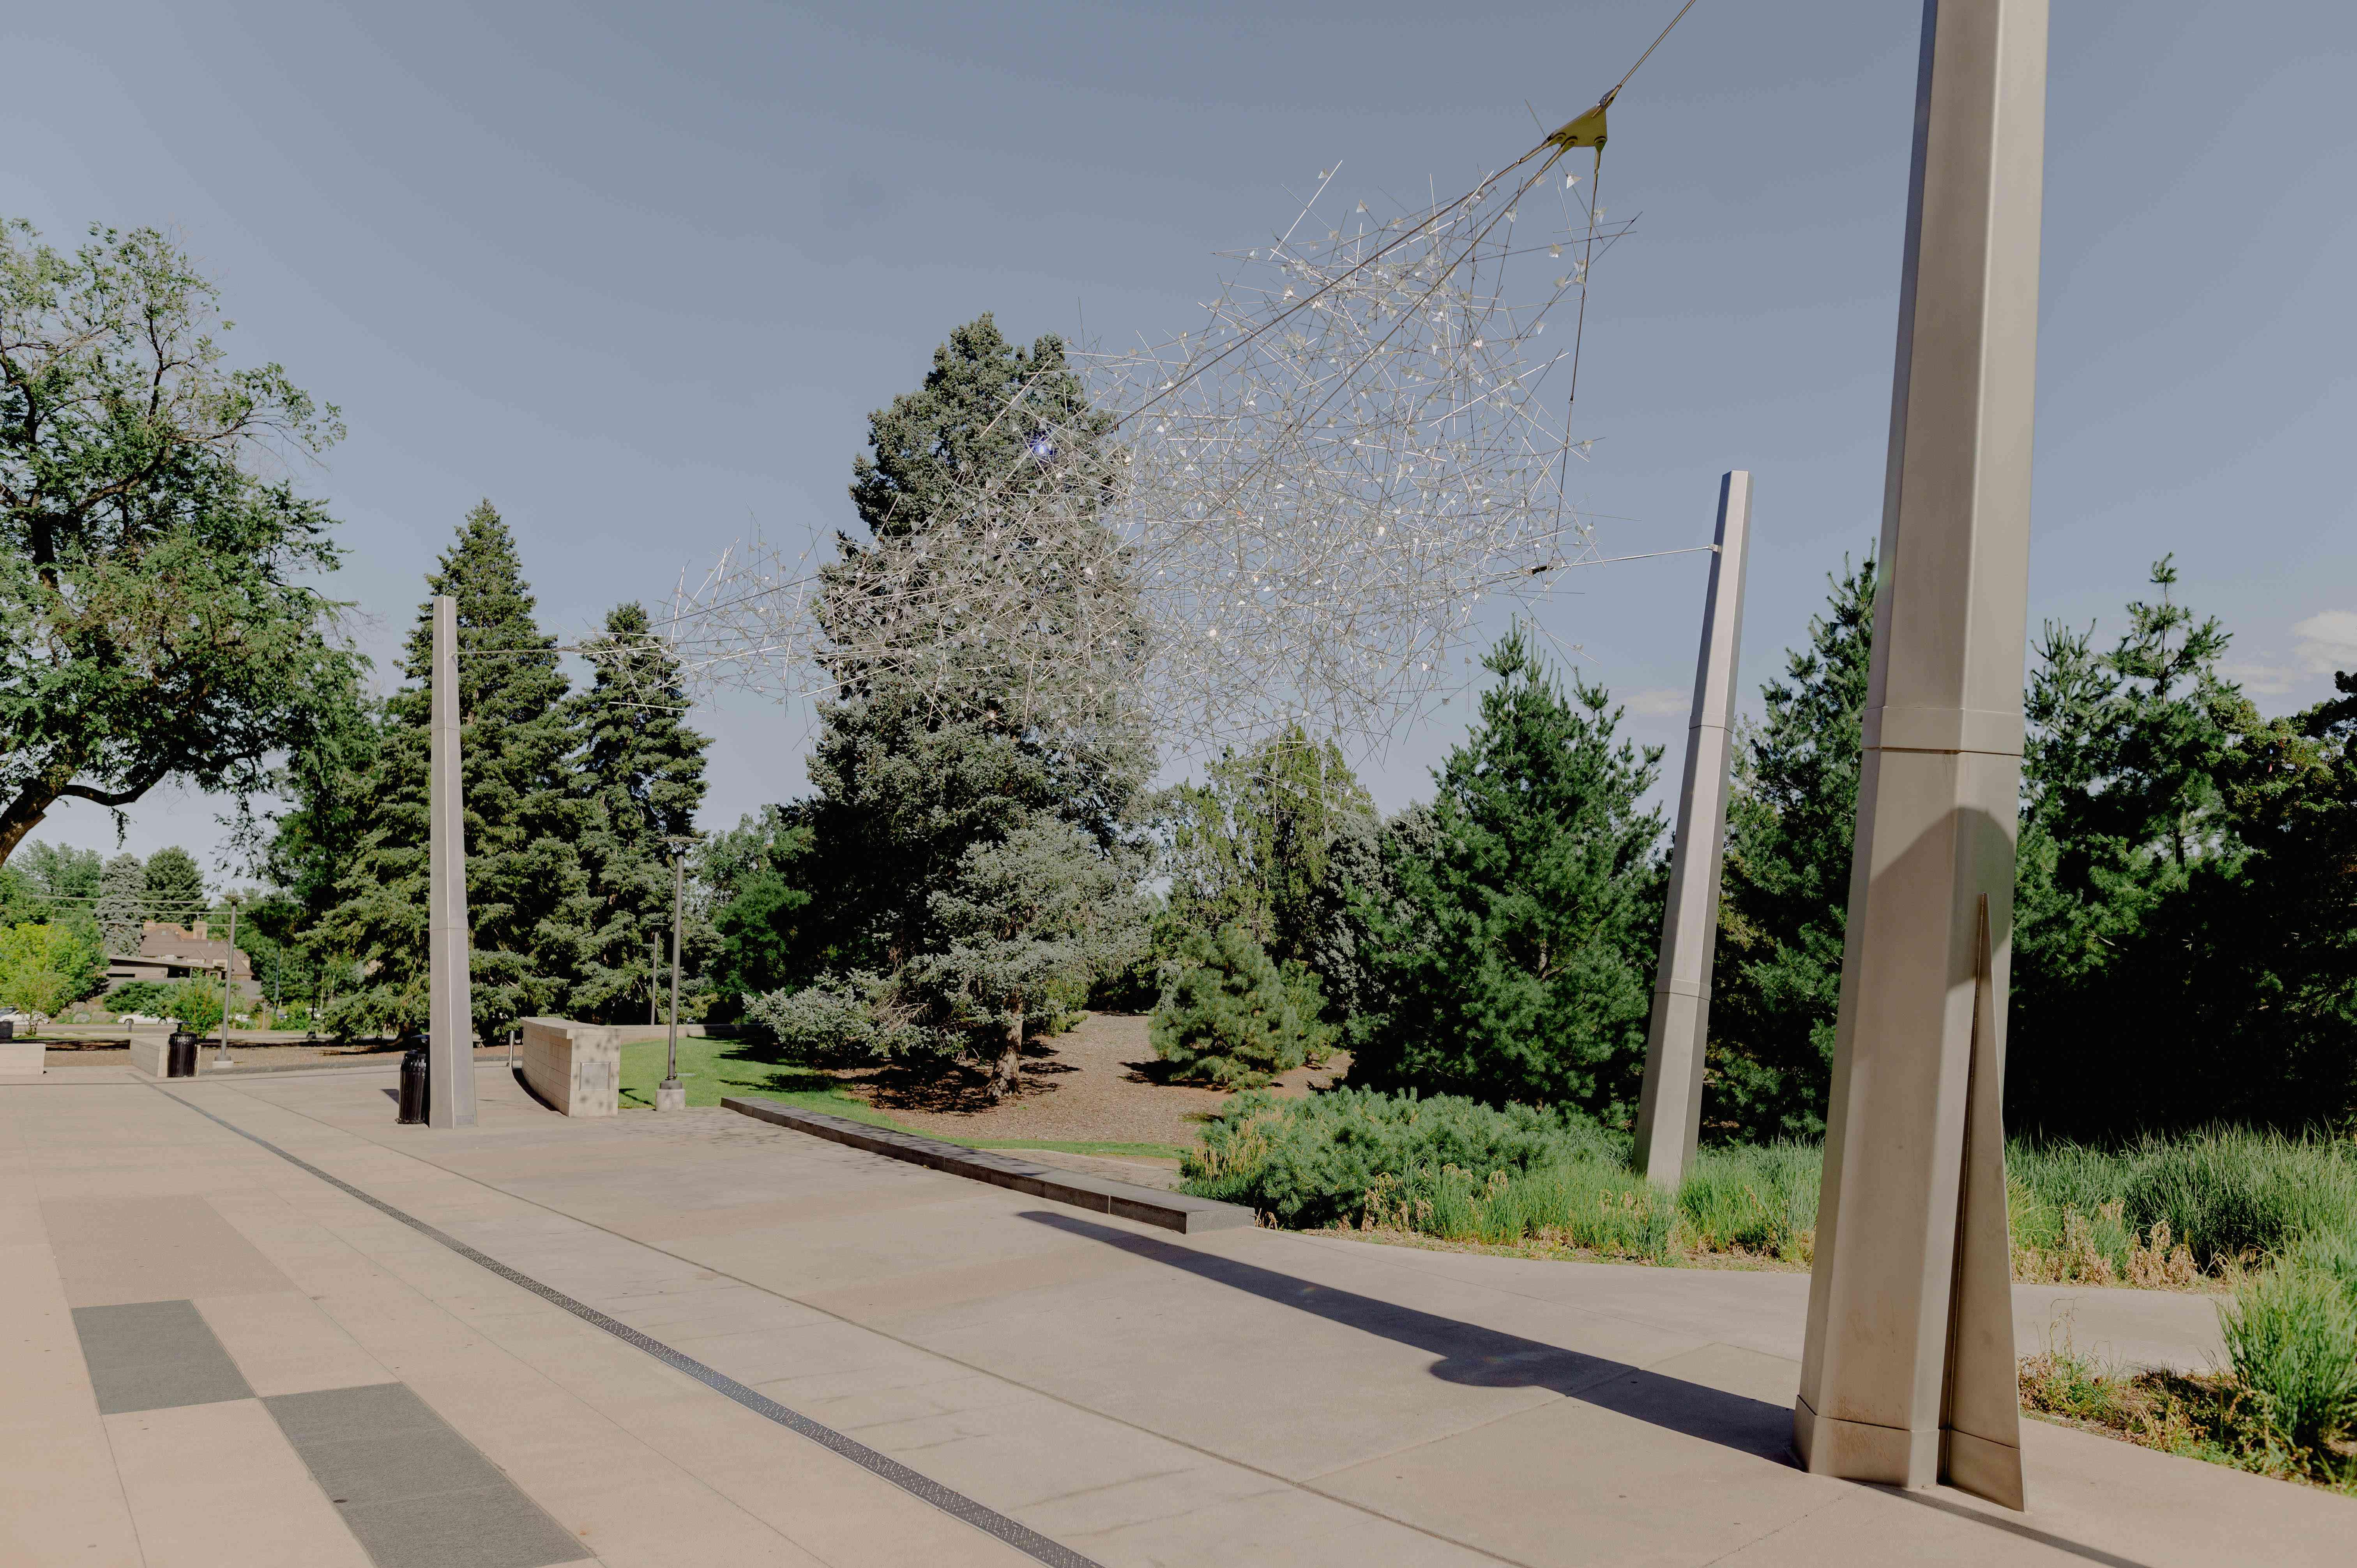 Denver Museum of Nature & Science